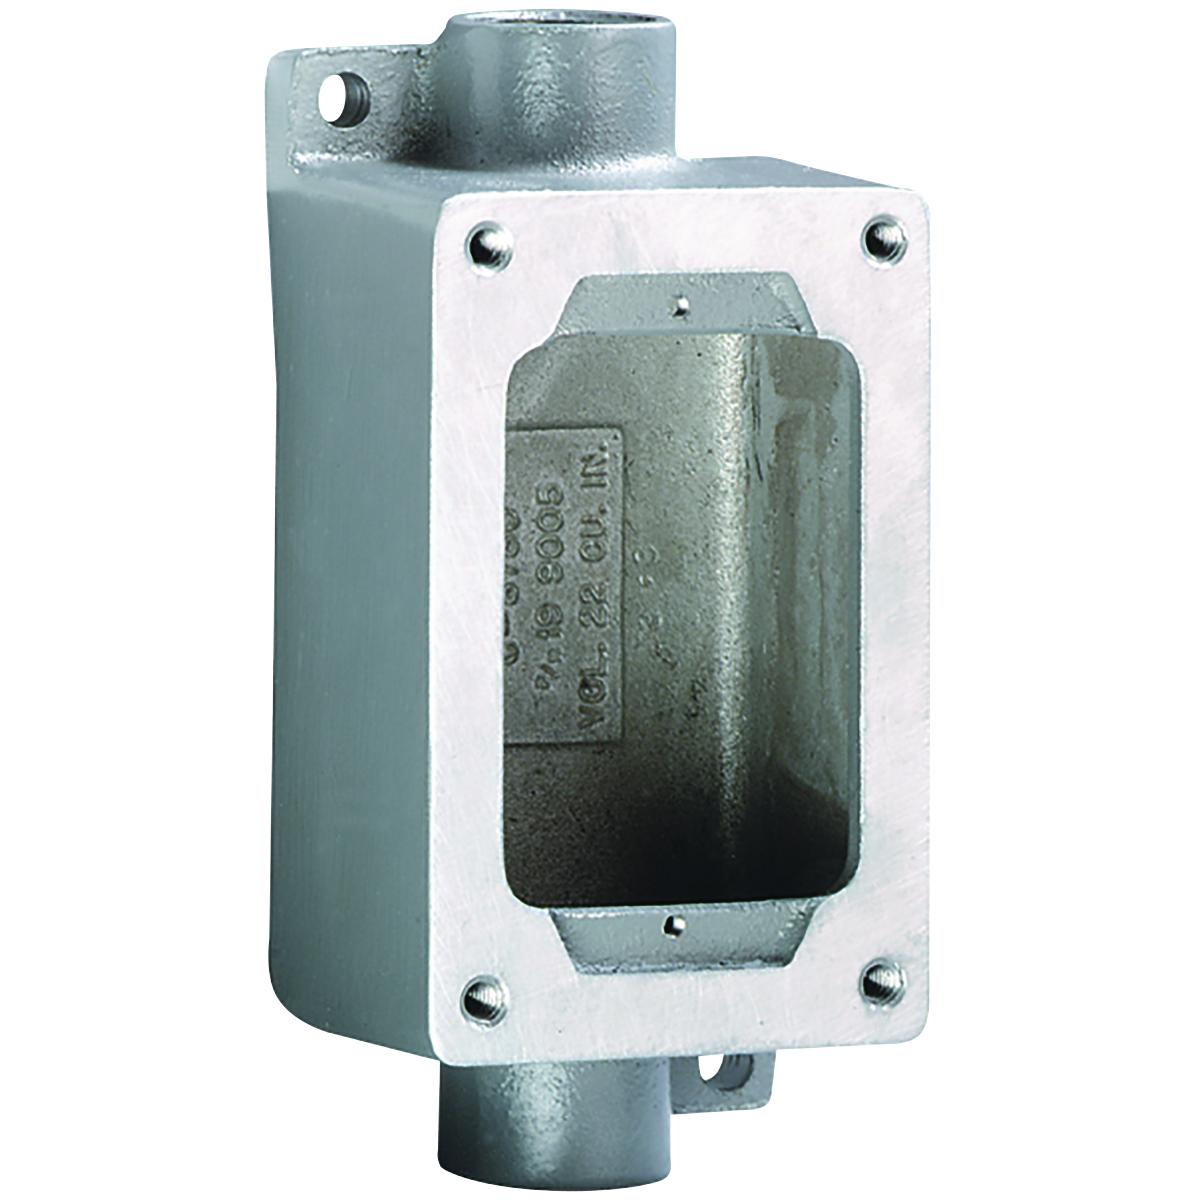 Hubbell SWB-4 Conduit Device Box